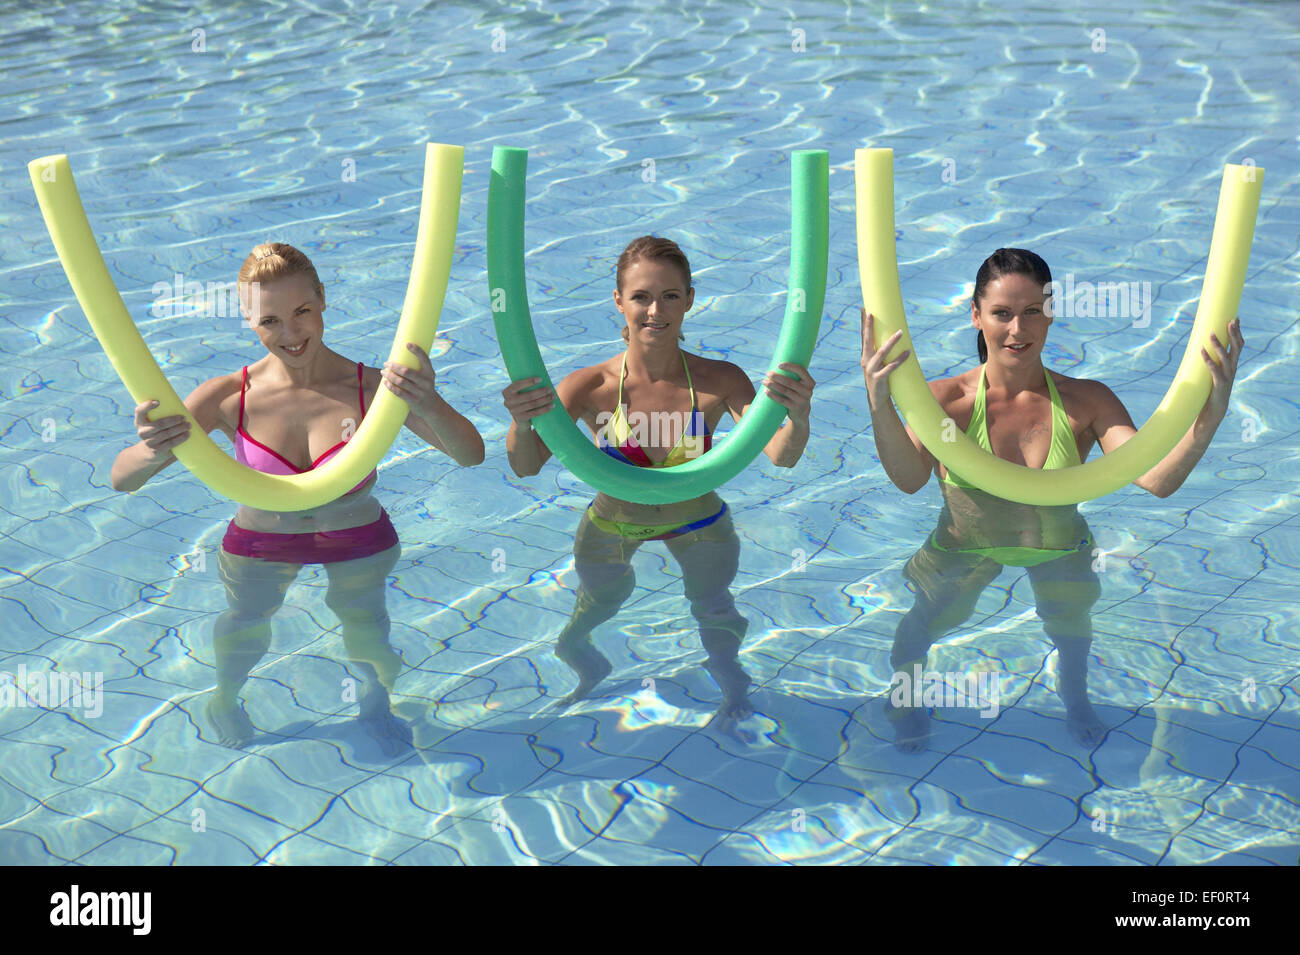 Wasserbecken Frau Frauen 3 Jung Aquaaerobic Aquagymnastik Wassergymnastik Sport Freizeit Hobby Aktivitaet Fitness - Stock Image